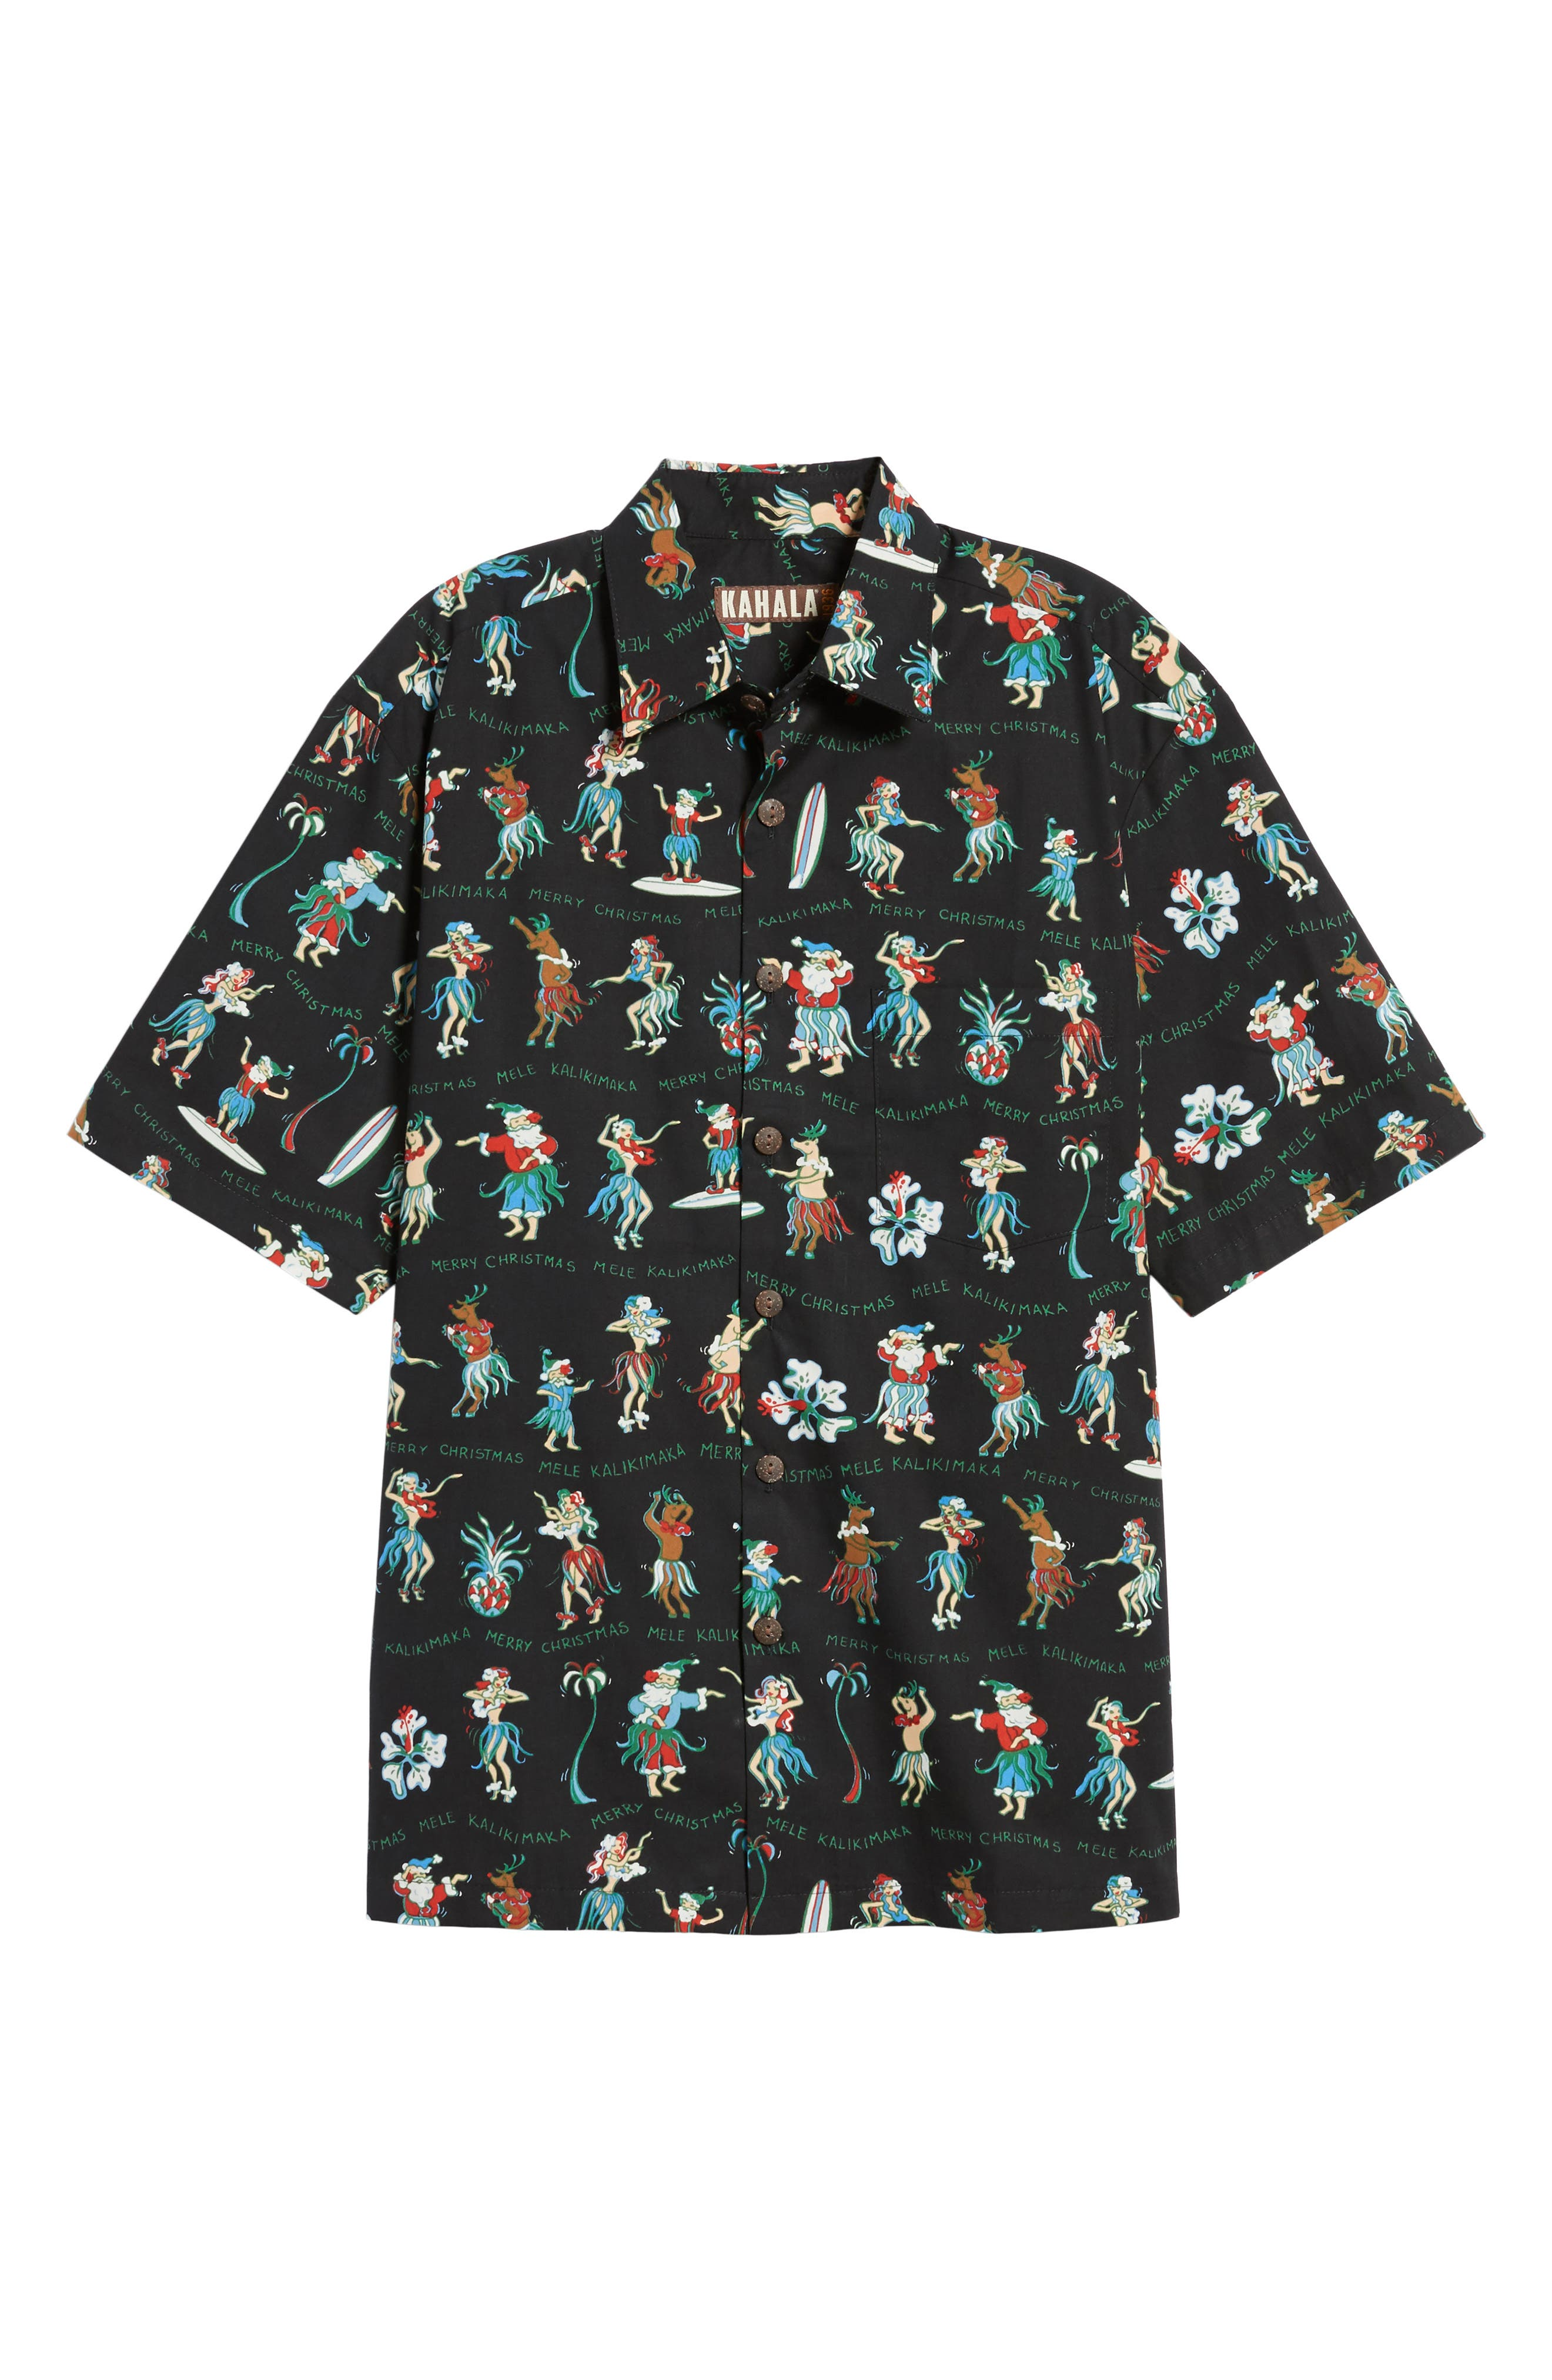 Kalikimaka Classic Fit Print Camp Shirt,                             Alternate thumbnail 6, color,                             001